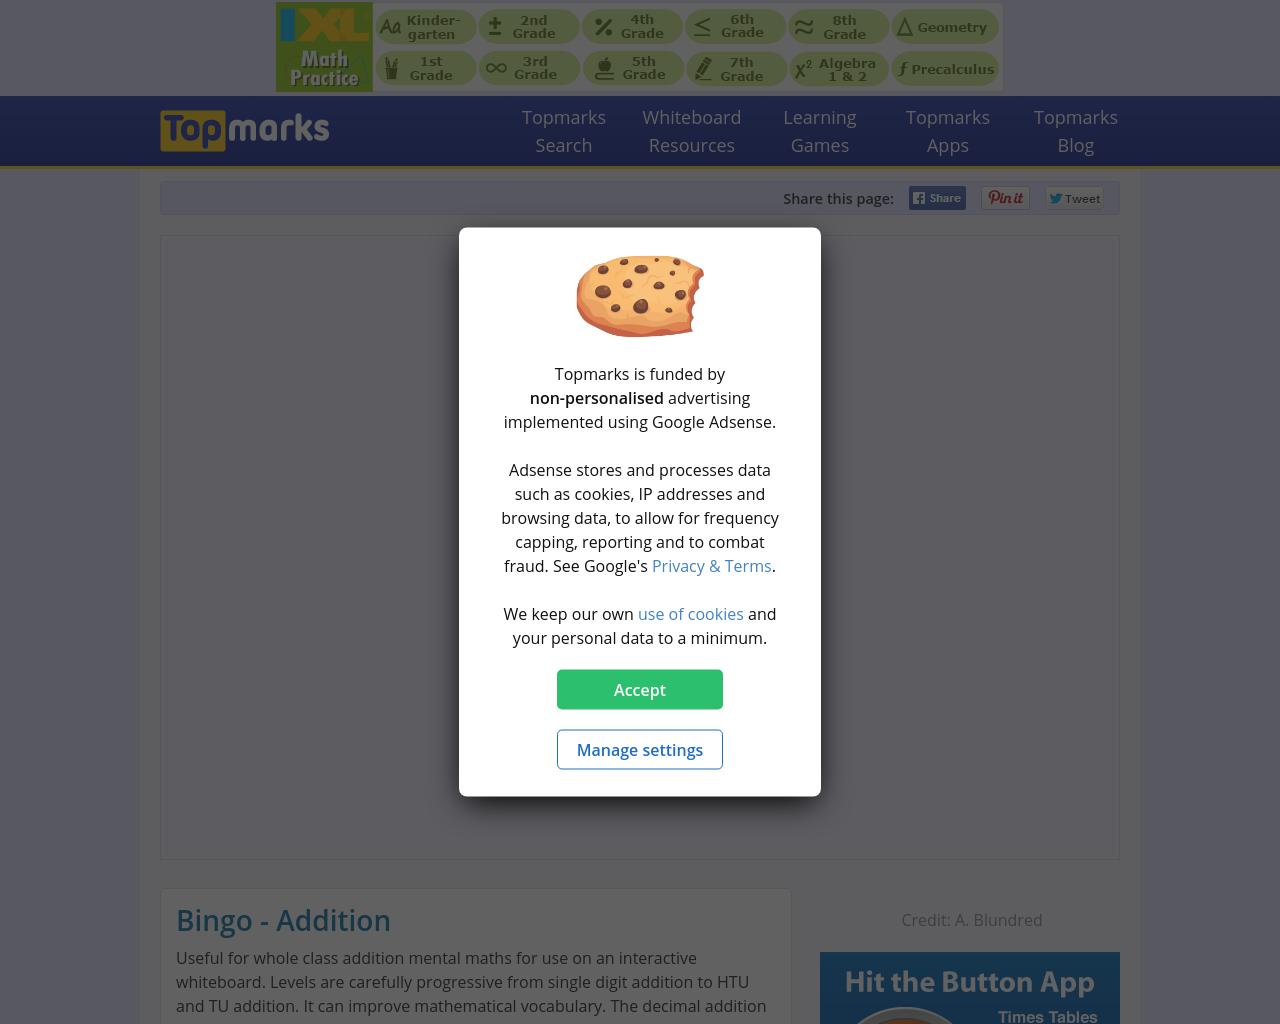 TopMarks: Bingo Addition